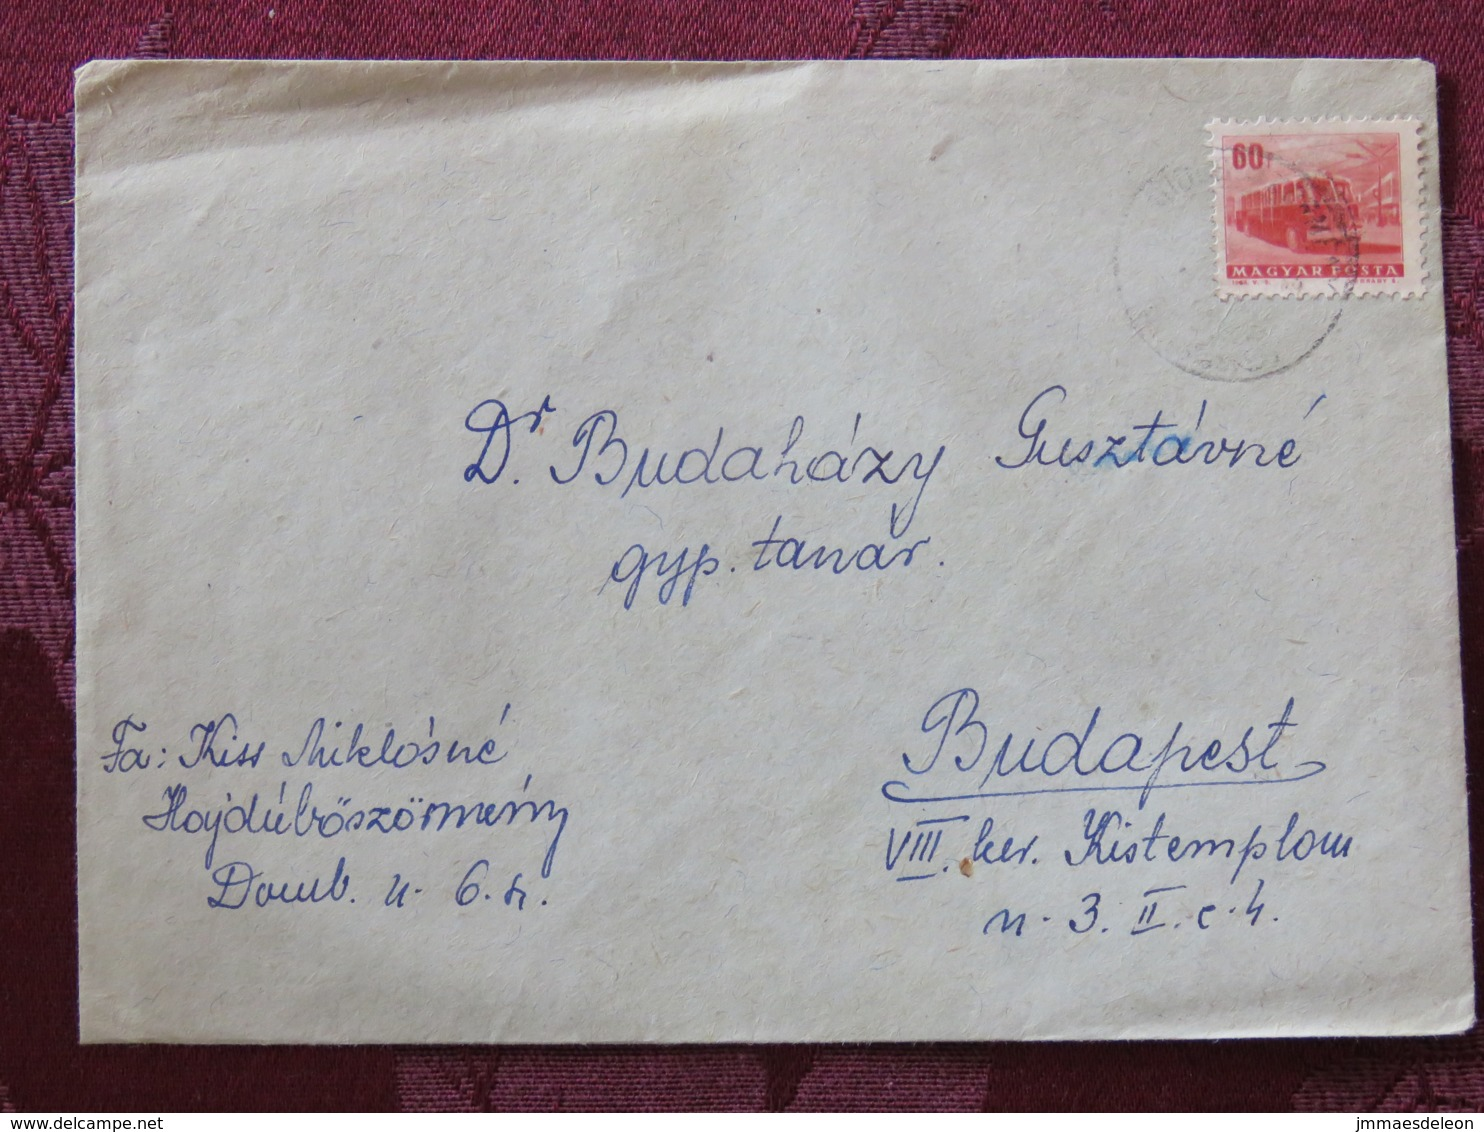 Hungary 1965 Cover Hajduboszomeny To Budapest - Autobus - Hungary